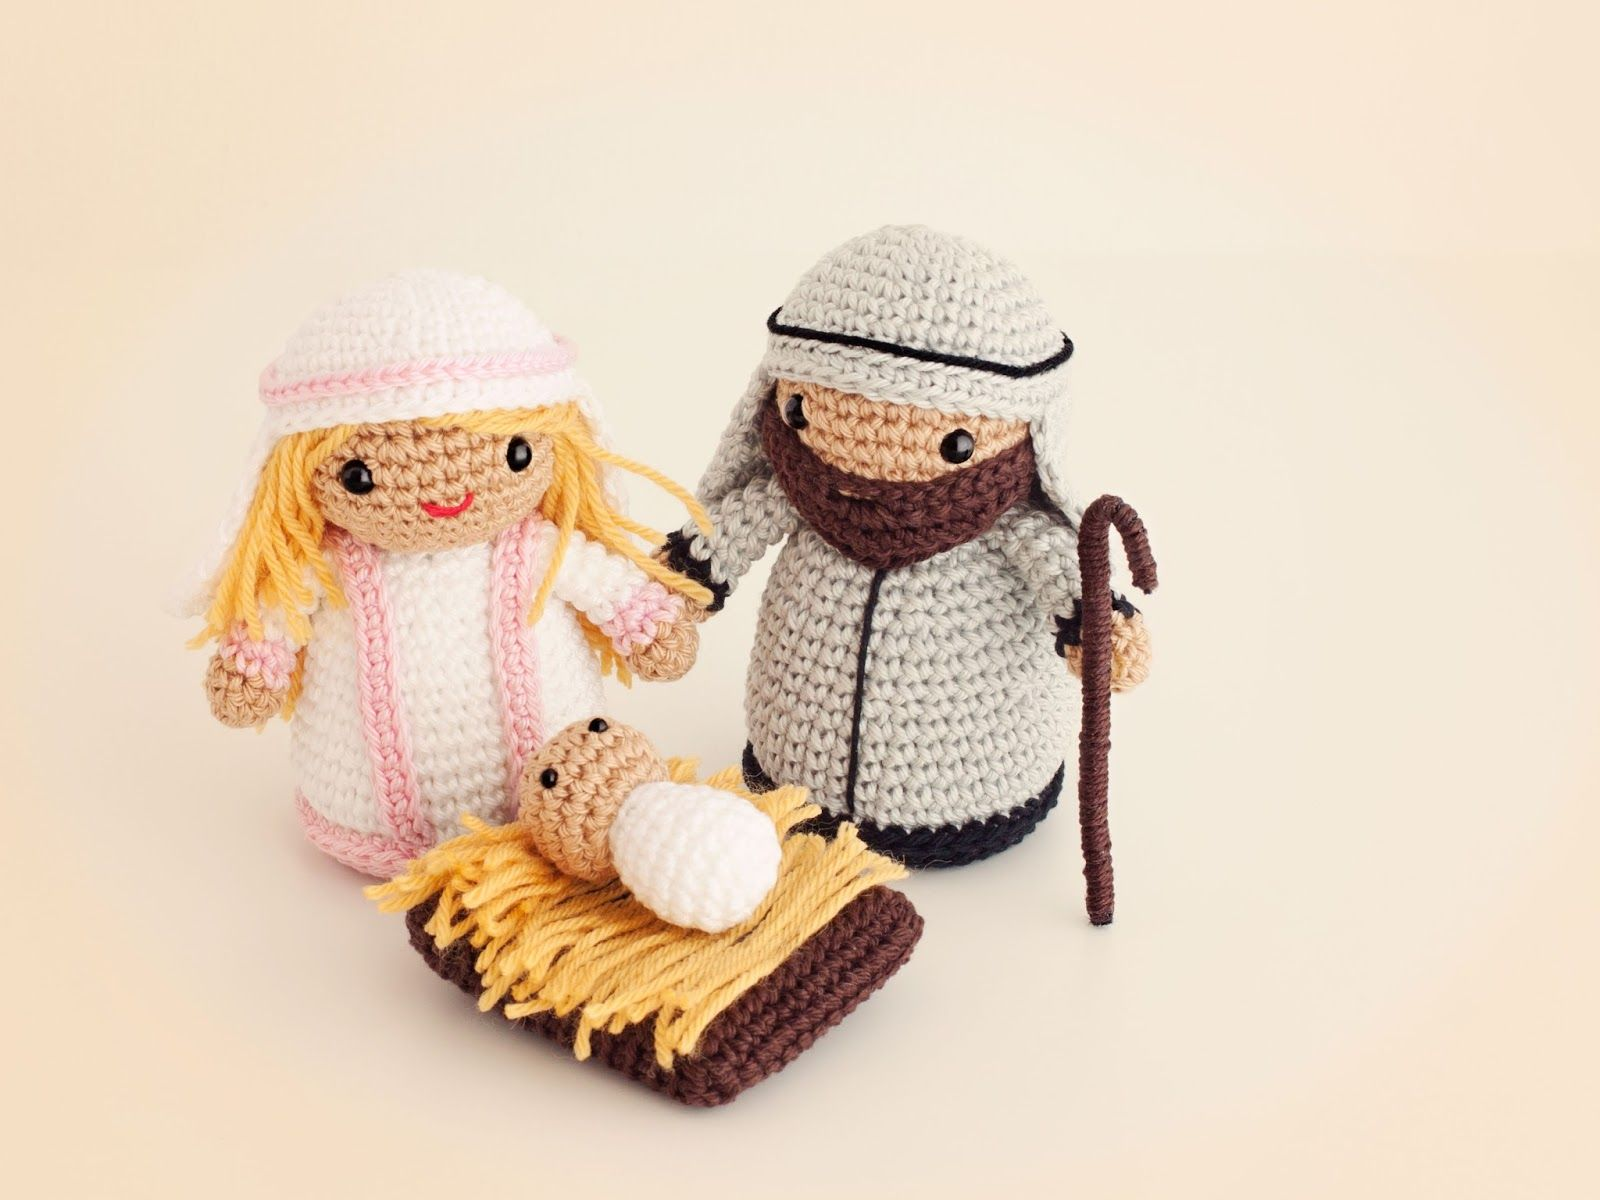 amigurumi nativity scene free crochet pattern tutorial. Black Bedroom Furniture Sets. Home Design Ideas